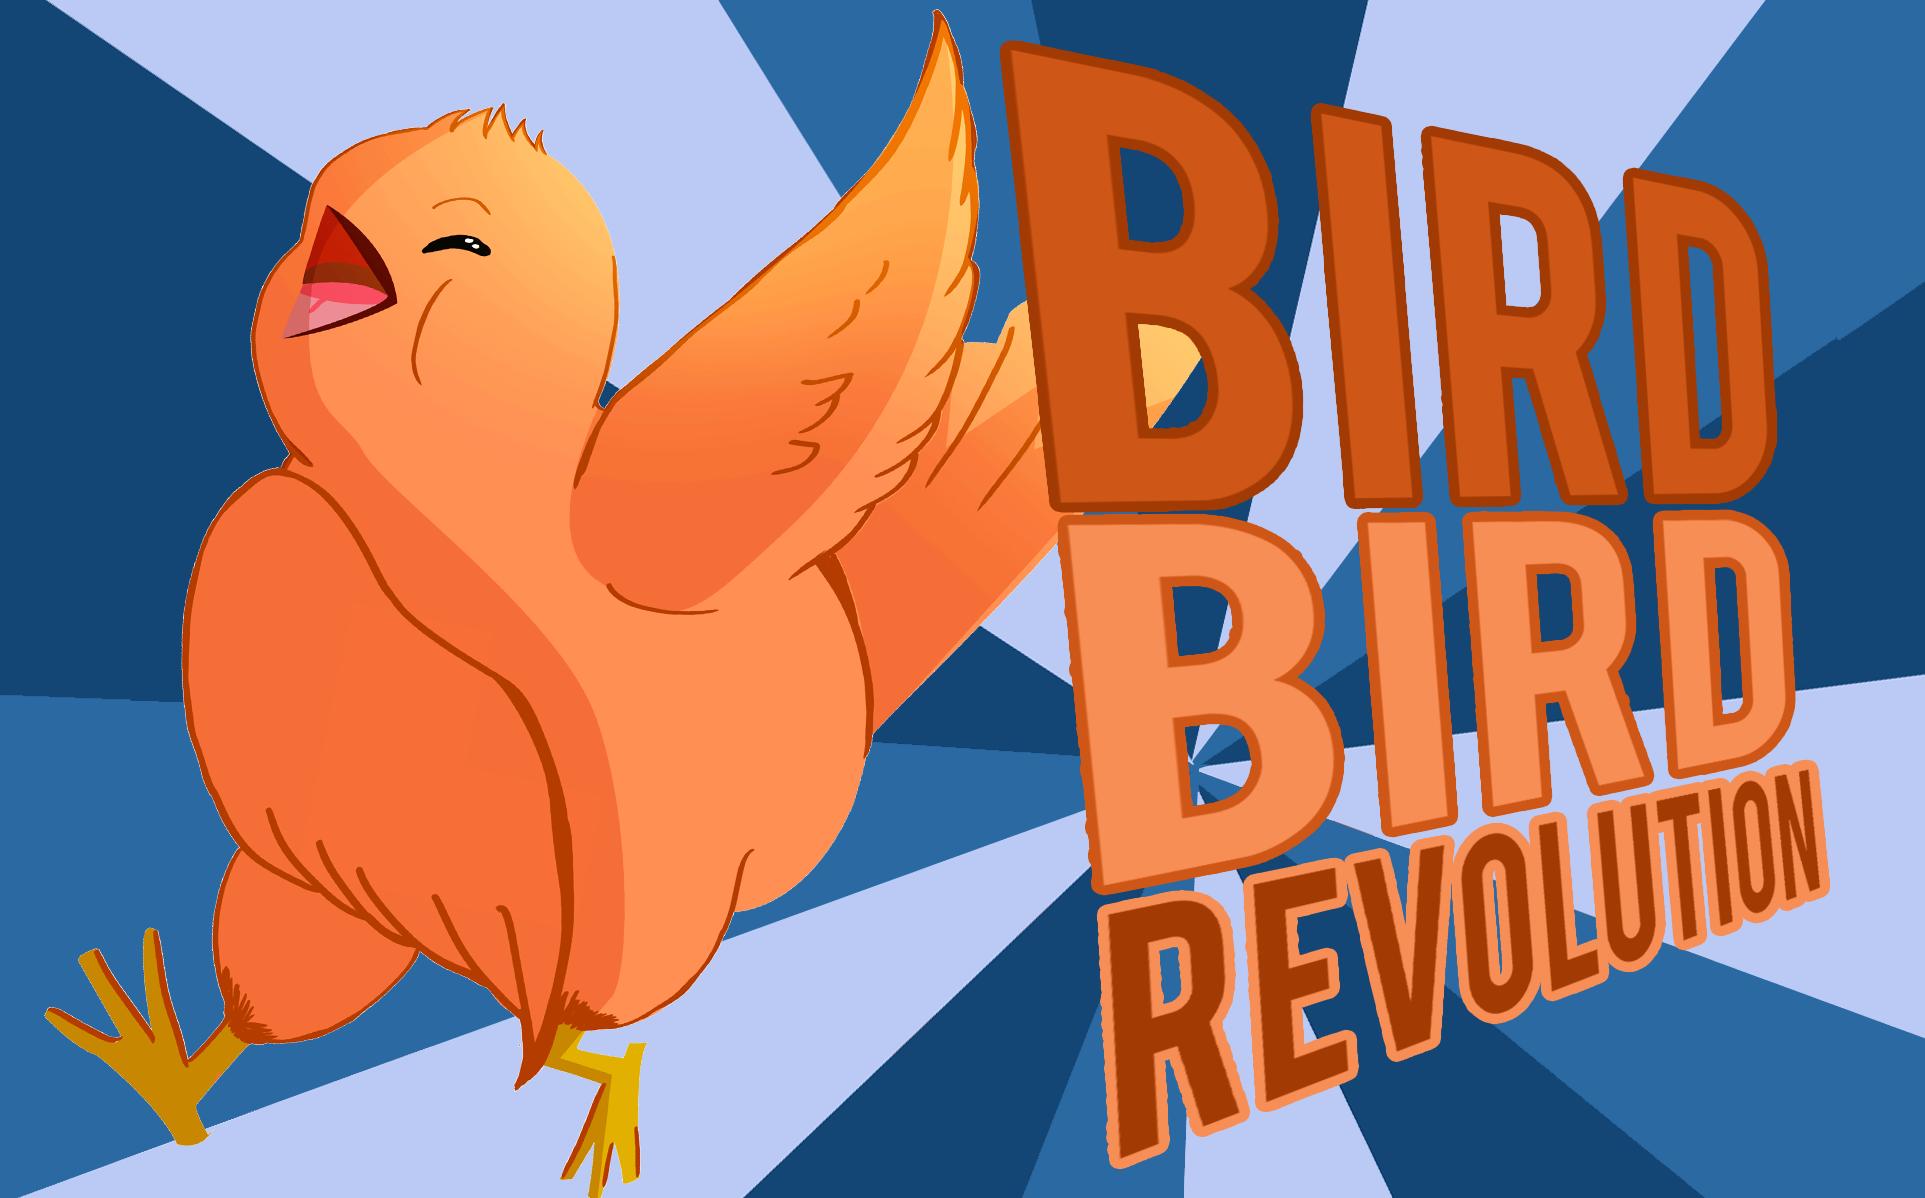 Bird Bird Revolurion